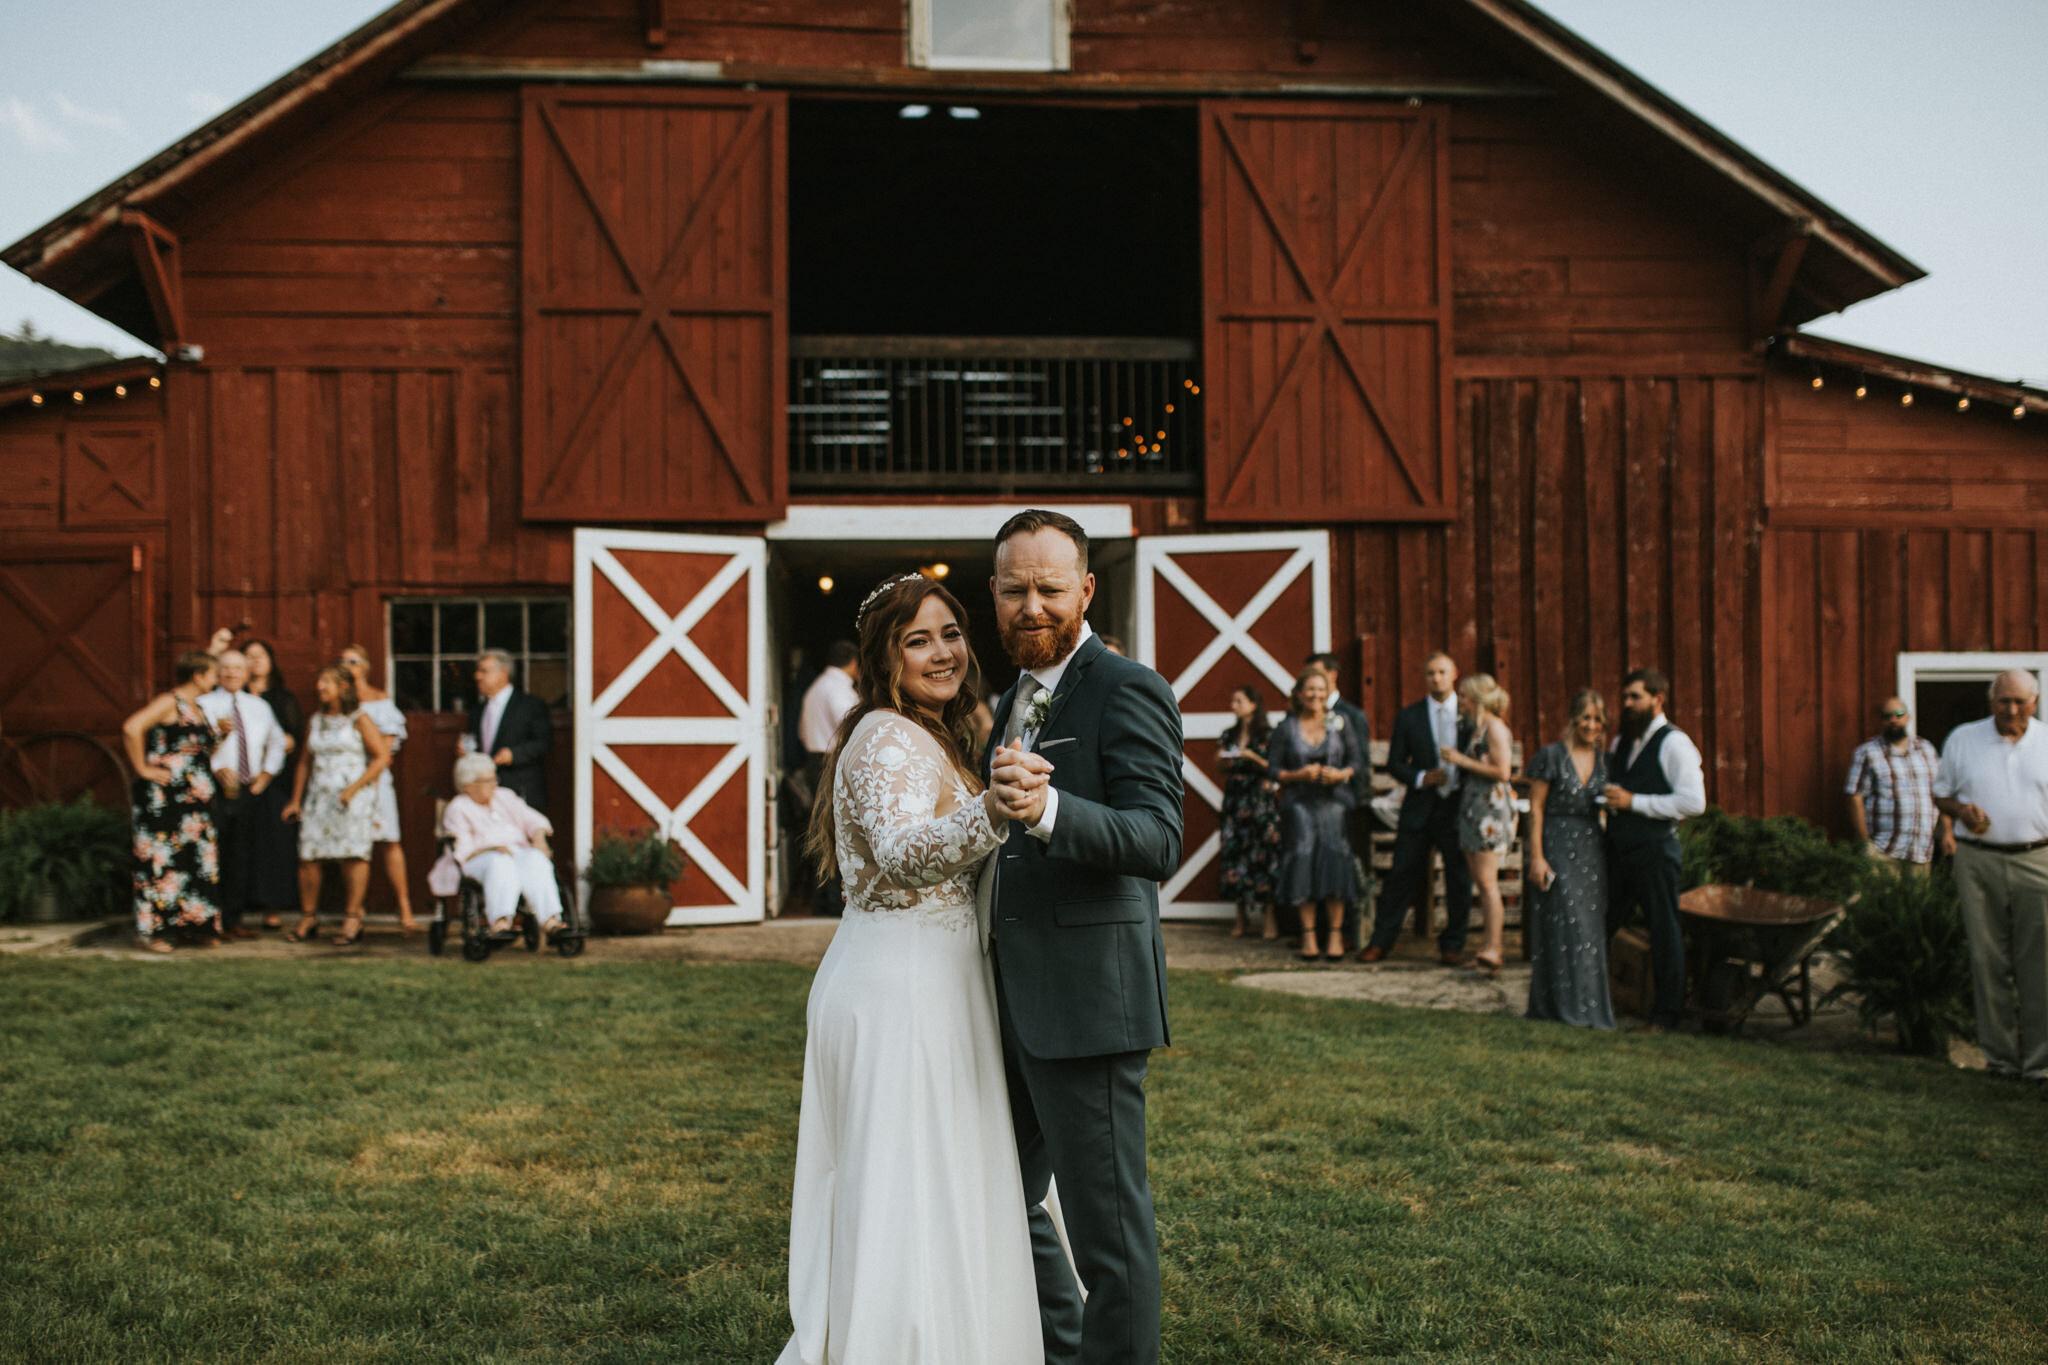 KateMatt-North-Georgia-Wedding-Photographer-Mountain-Laurel-Farm-124.jpg